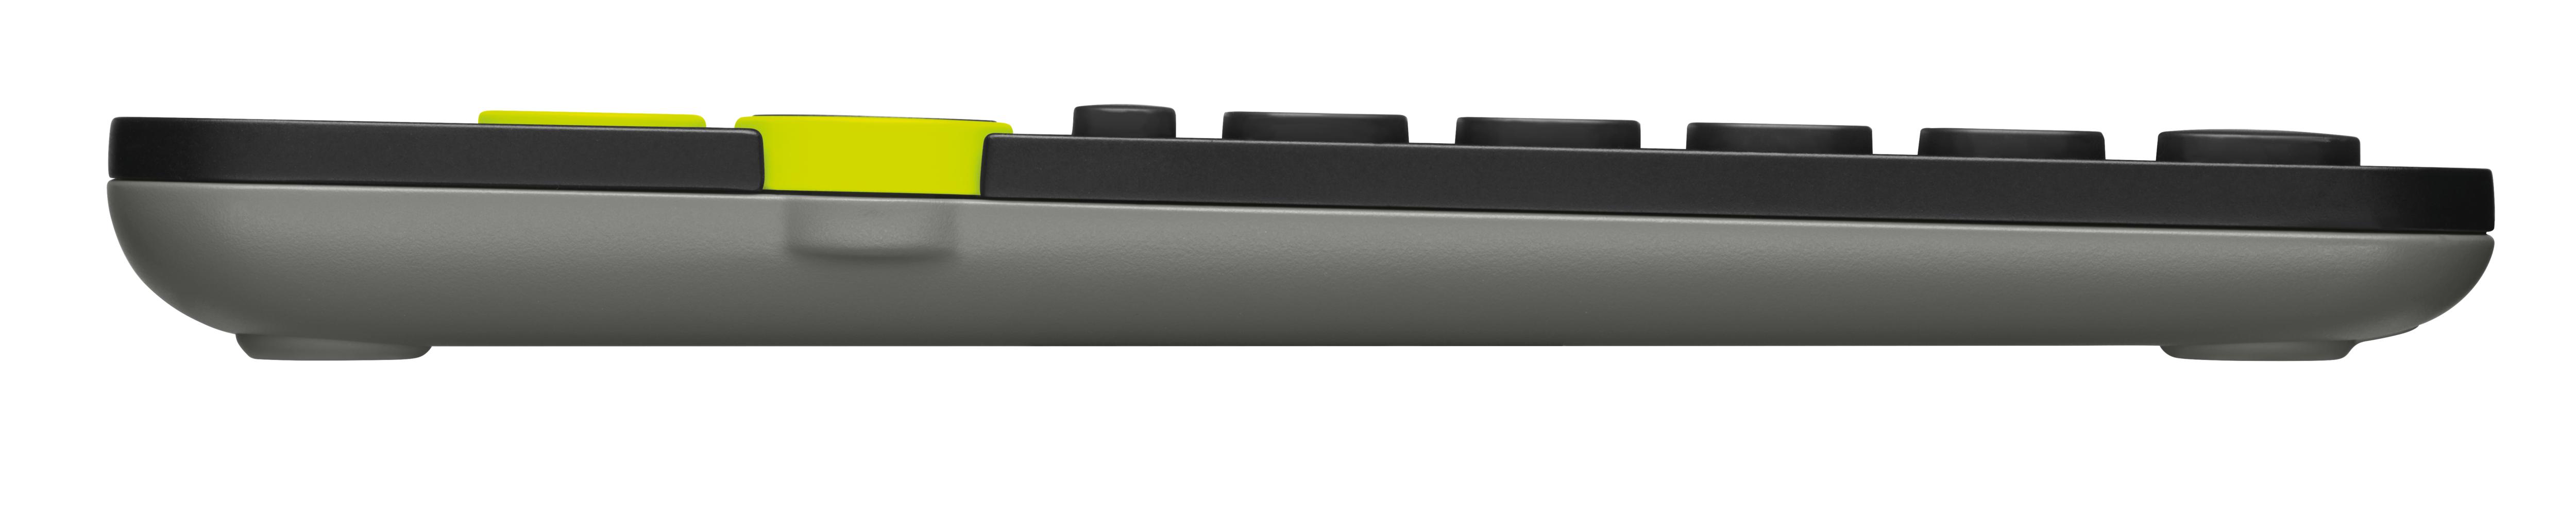 K480 Bluetooth Multi-Device Keyboard (zwart, Qwerty US)